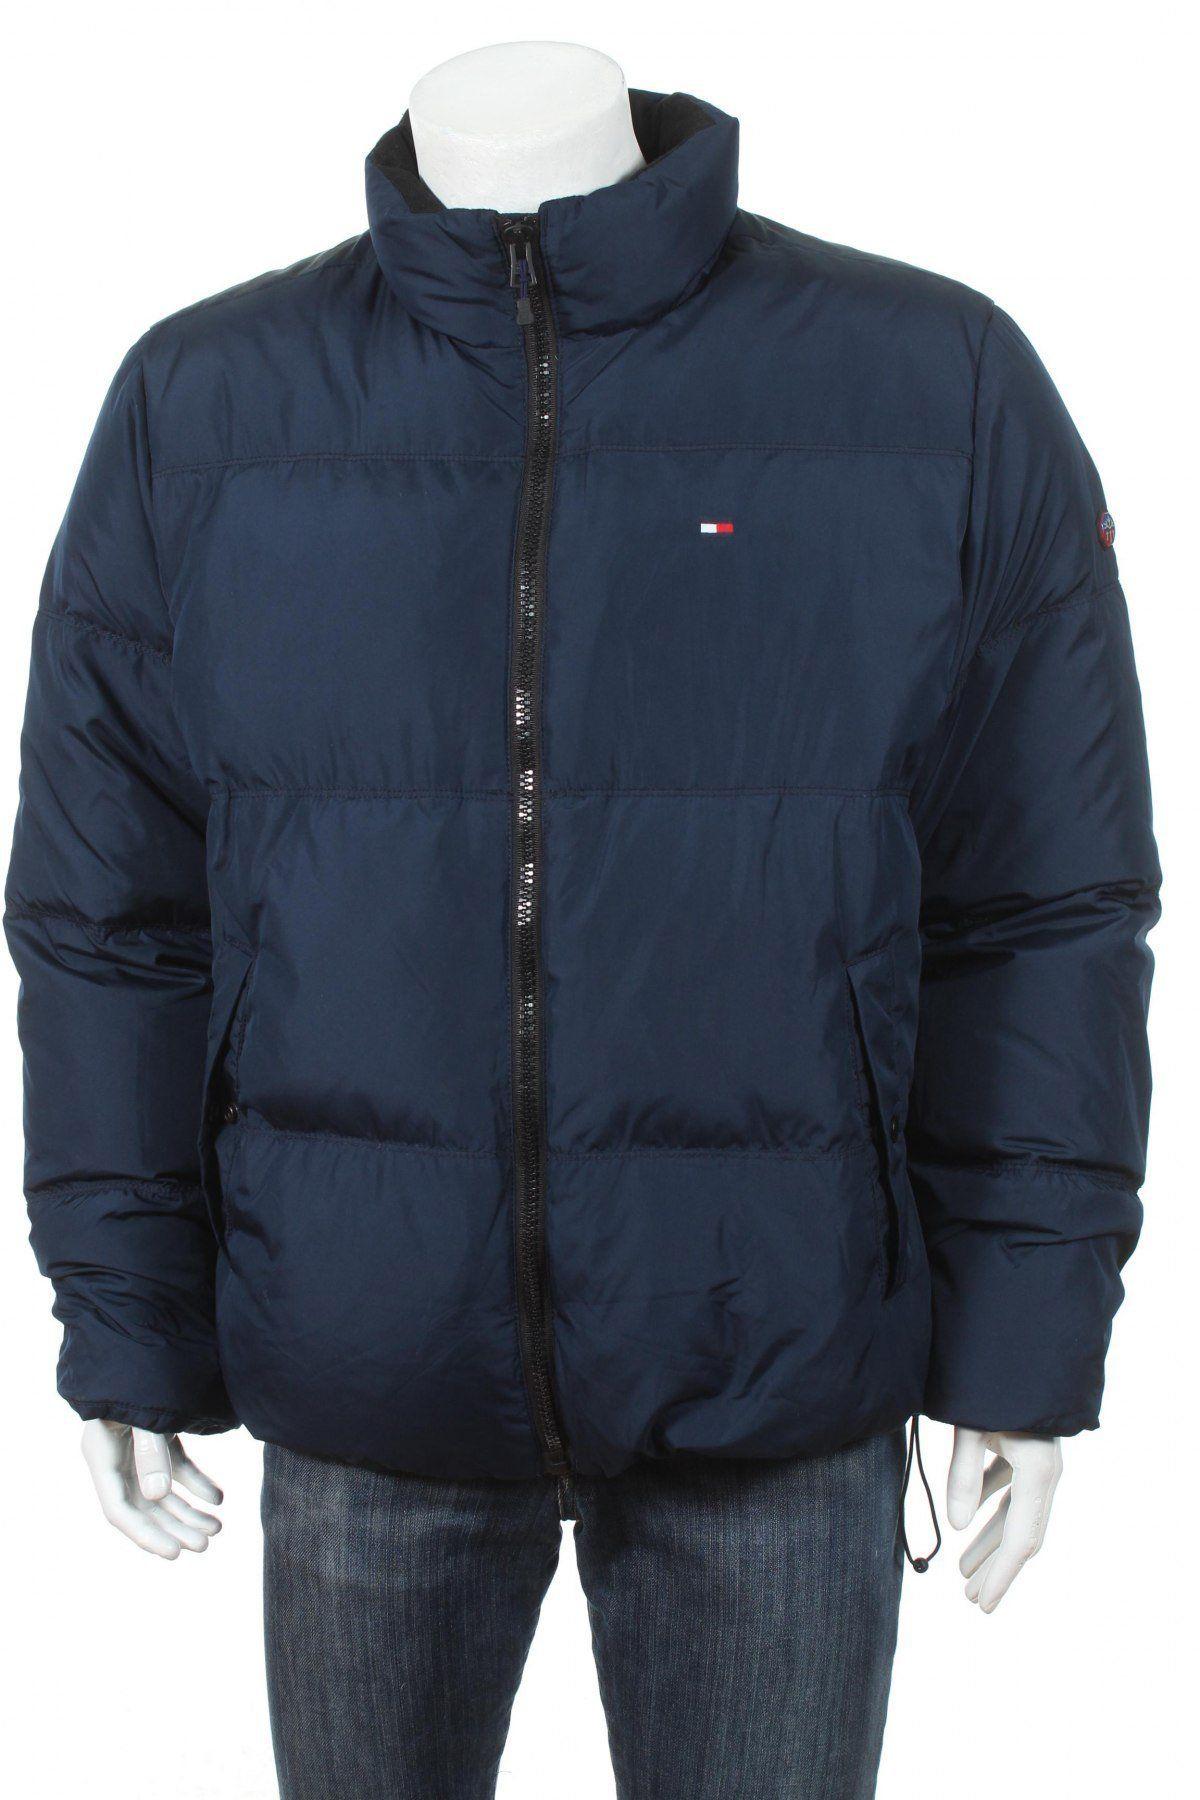 Vintage Tommy Hilfiger Goose Down Puffer Jacket Navy Blue Etsy Vintage Tommy Hilfiger Puffer Jackets Jackets [ 1800 x 1200 Pixel ]